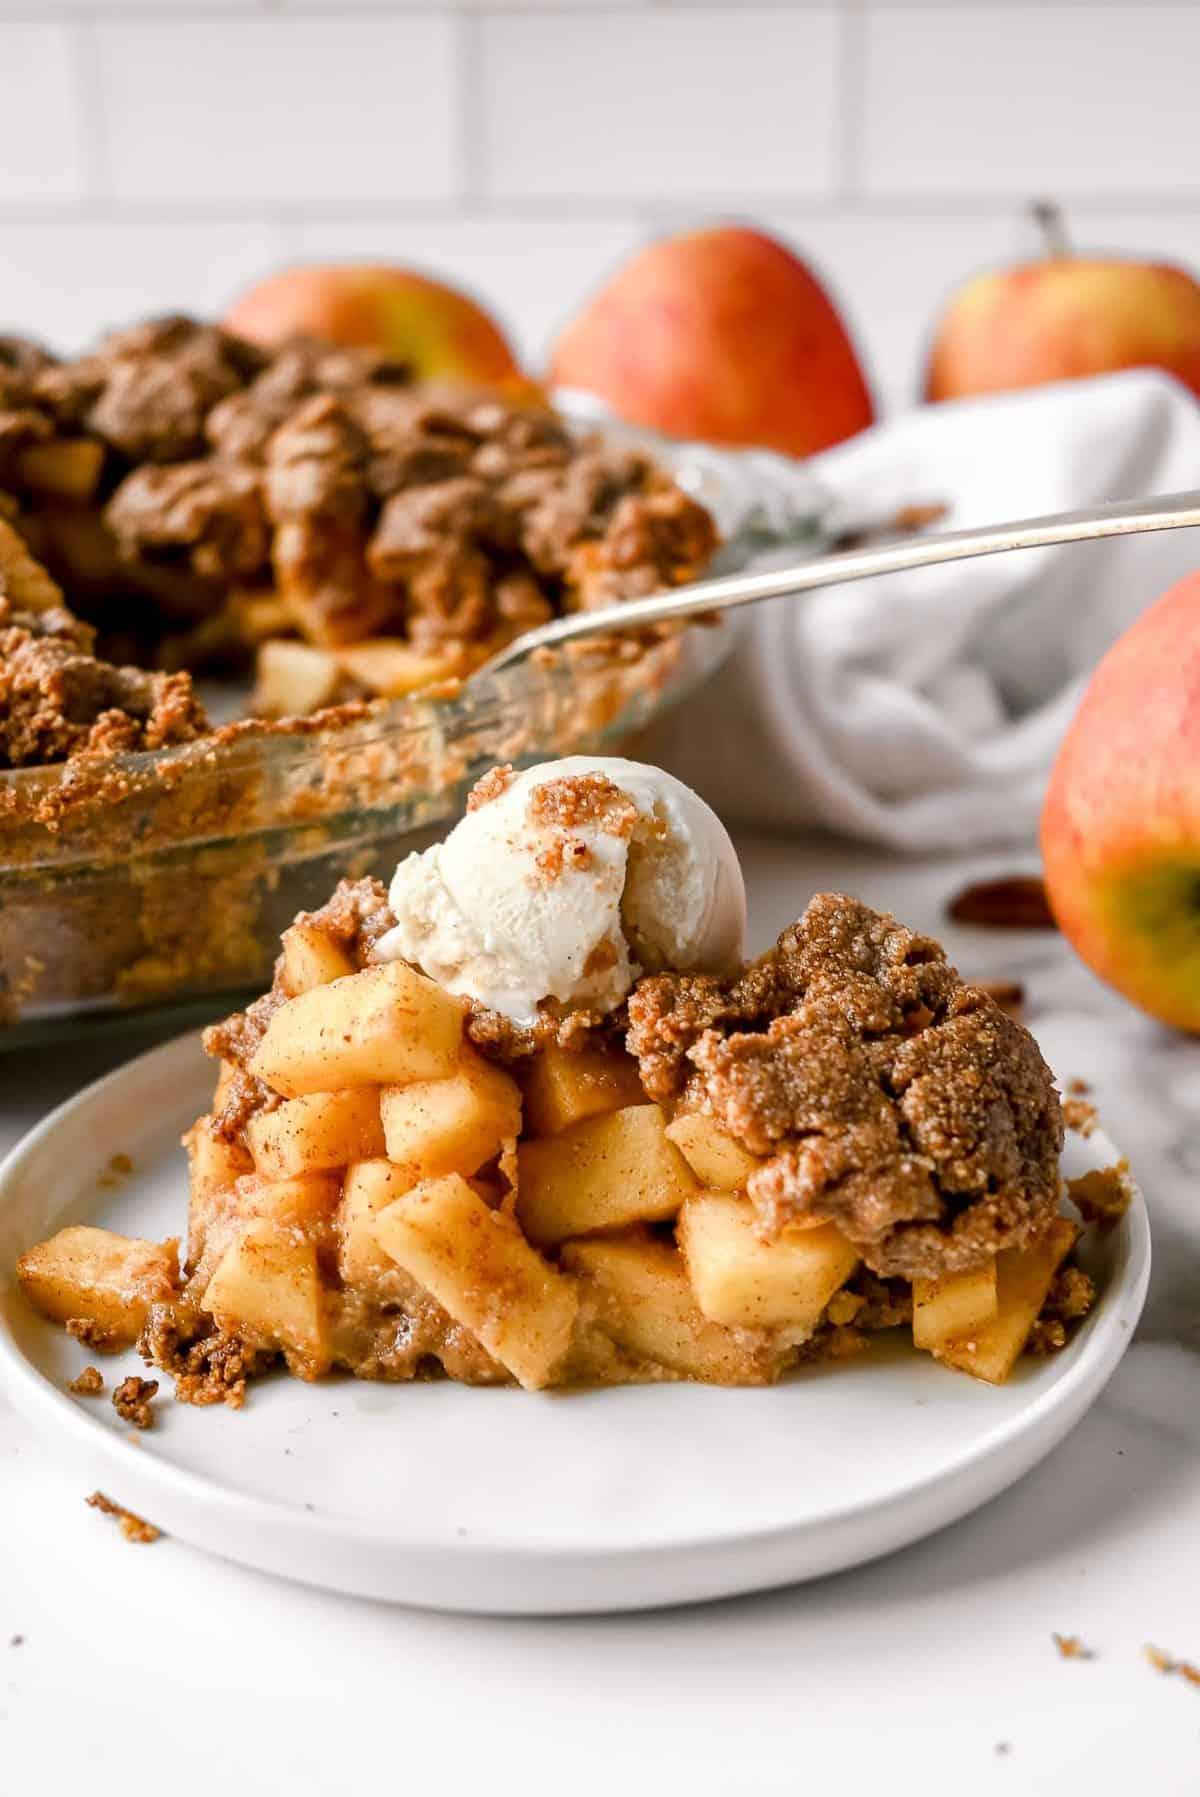 slice of healthy apple pie